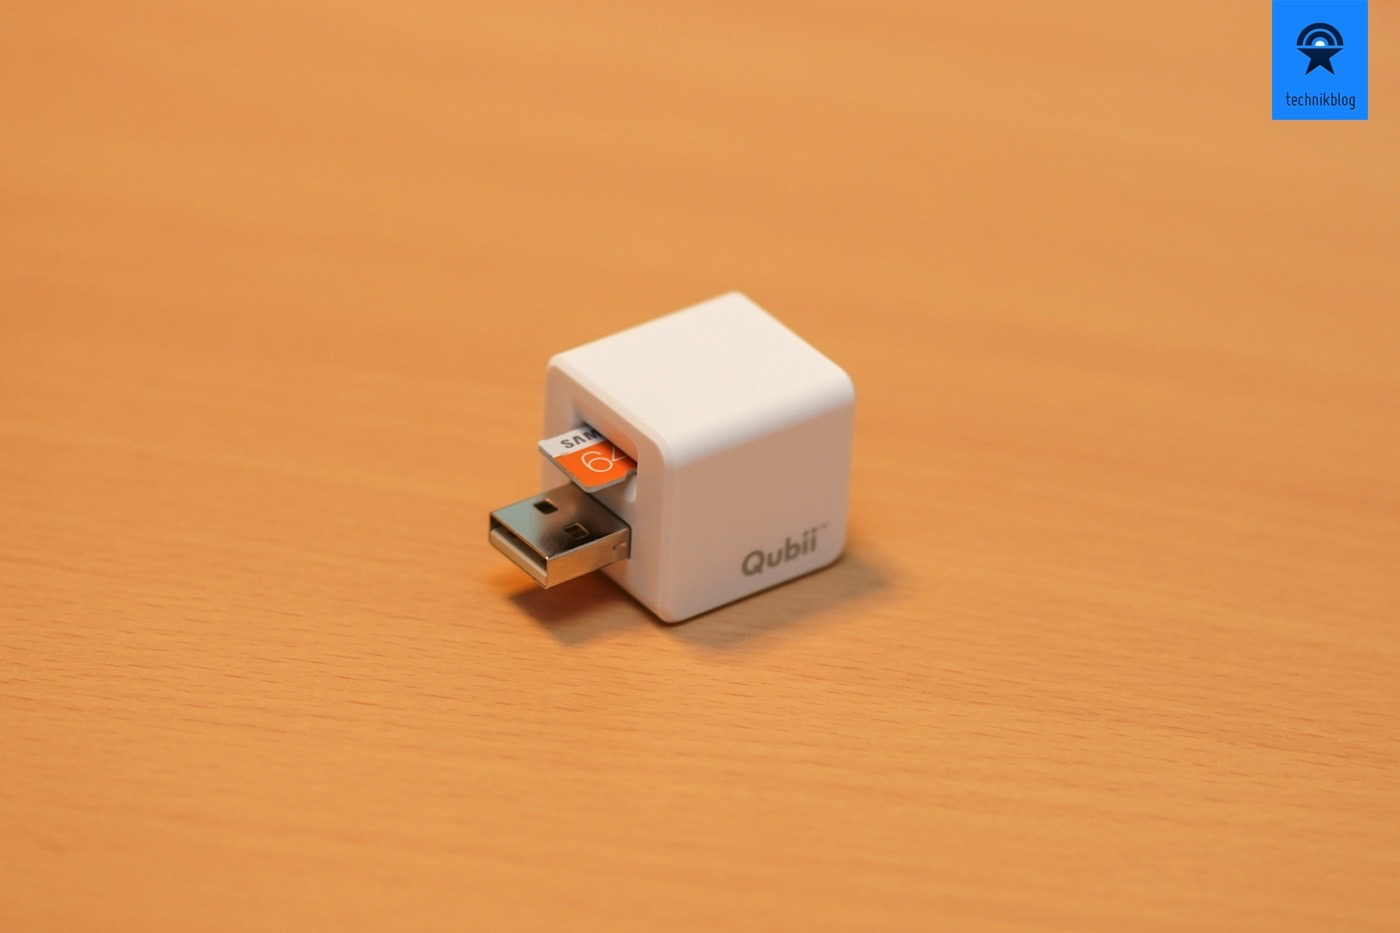 iOS Backup auf microSD-Karte mit Qubii